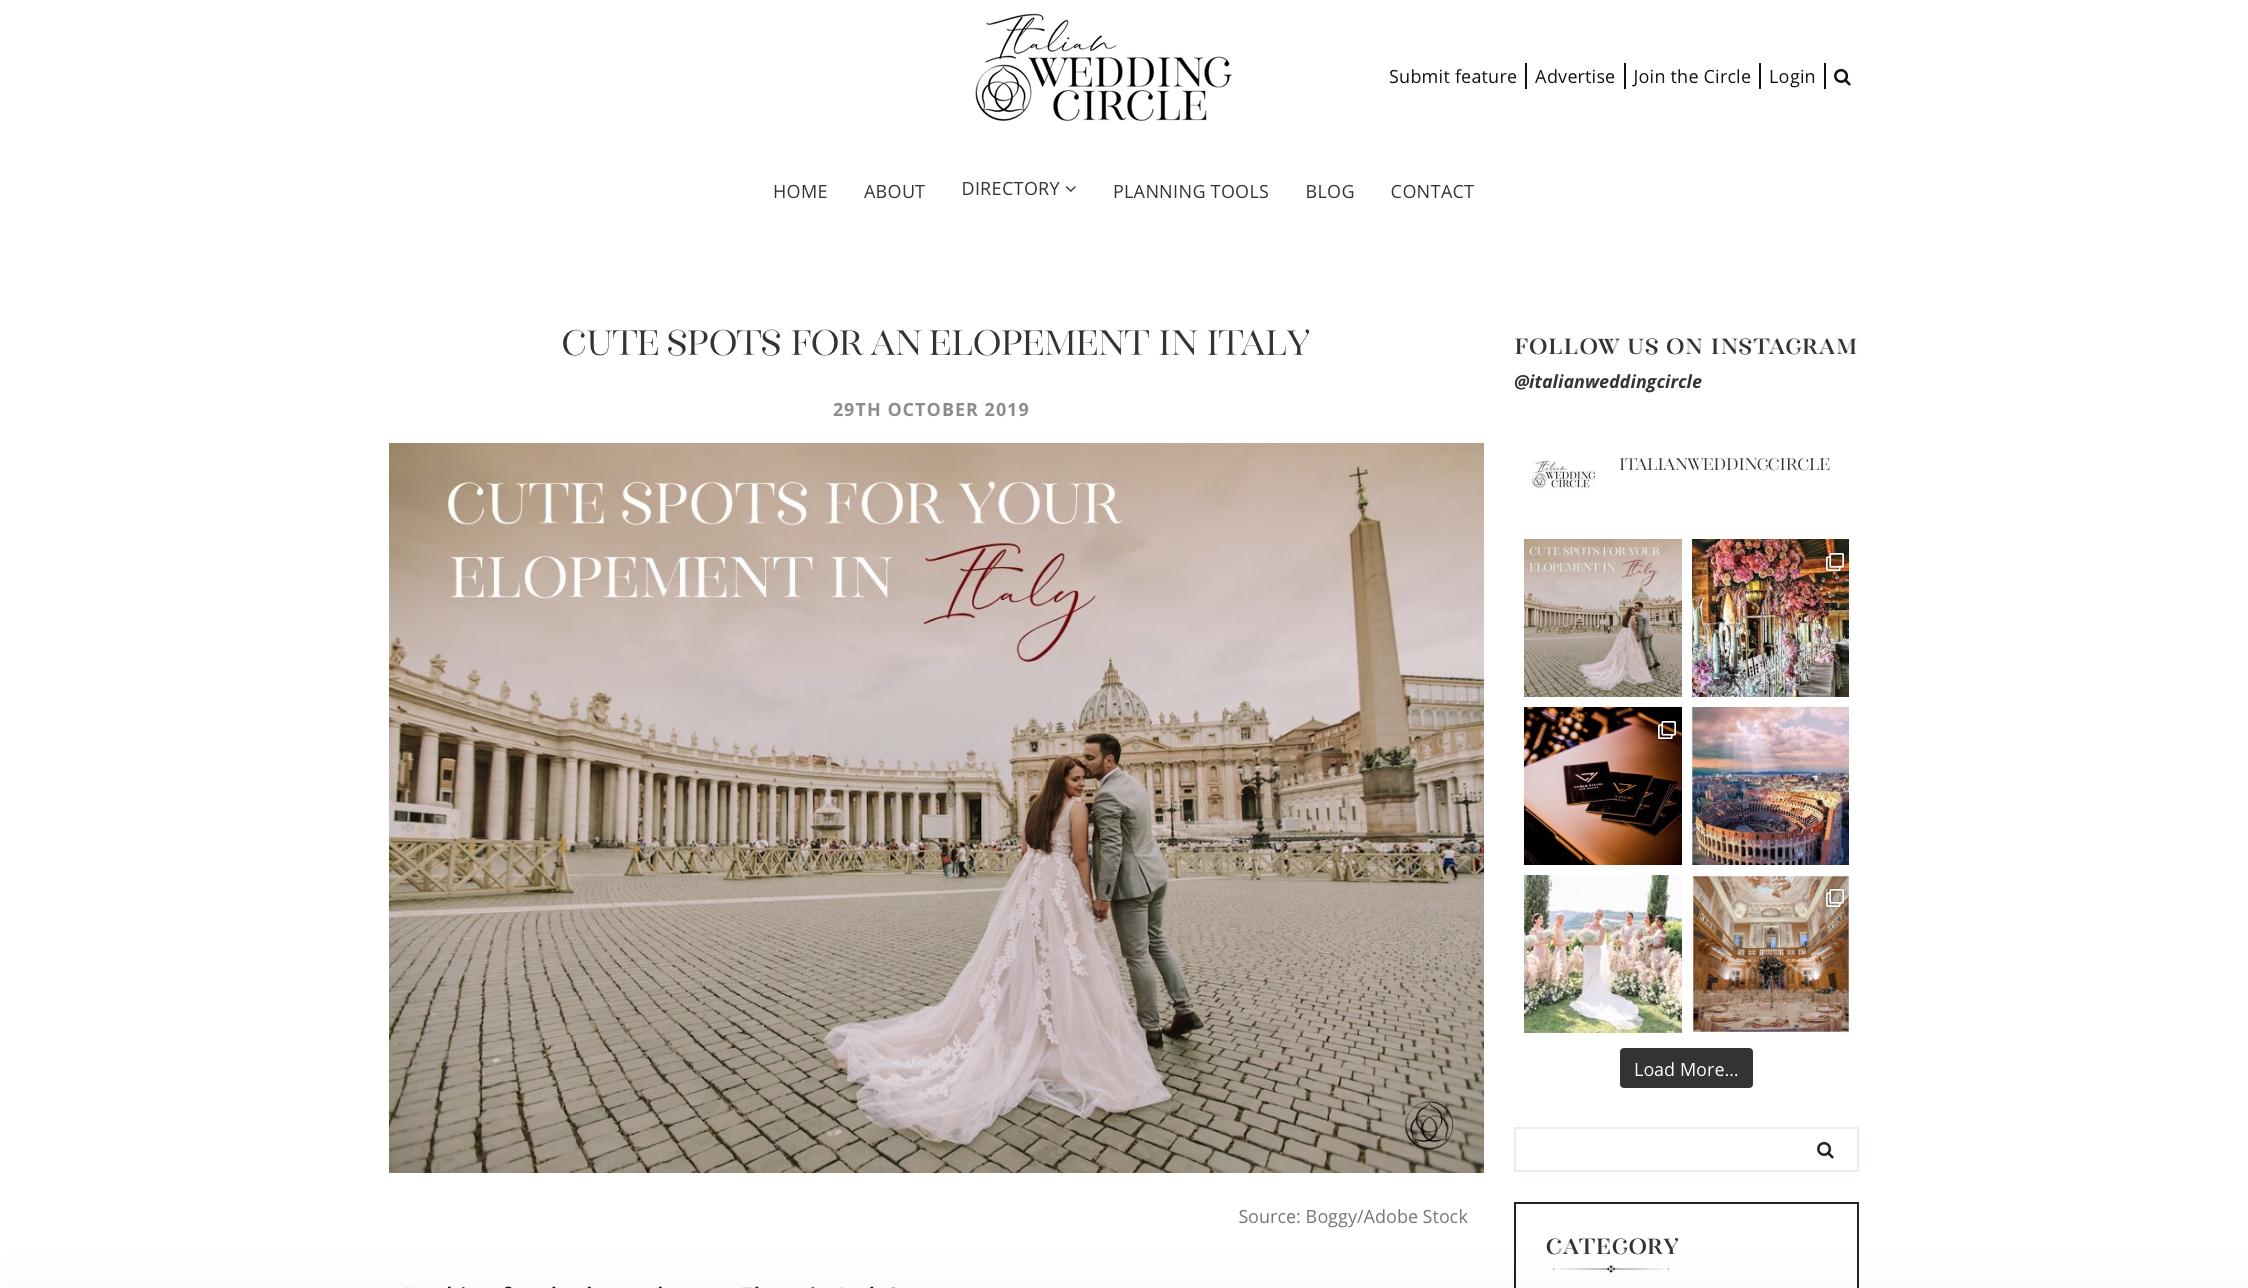 Italian Wedding Circle Elopements